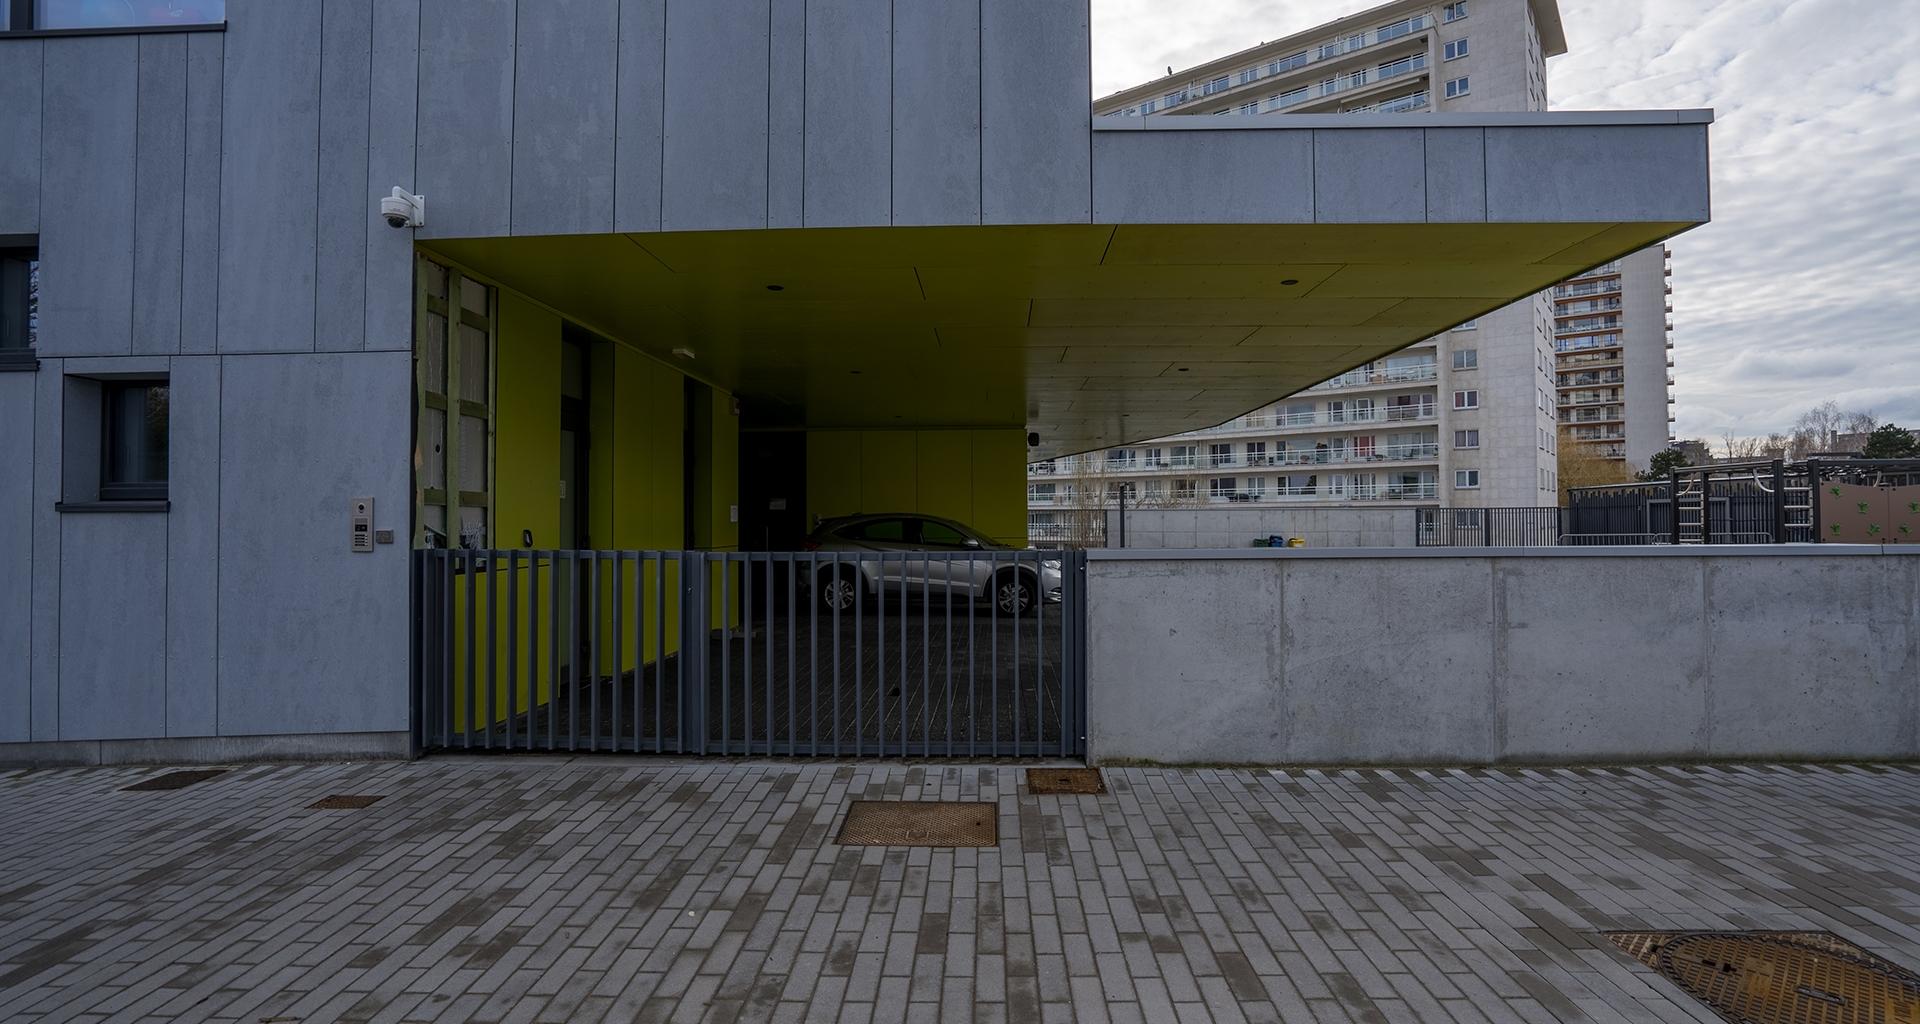 Brussels school cement fiber board cladding